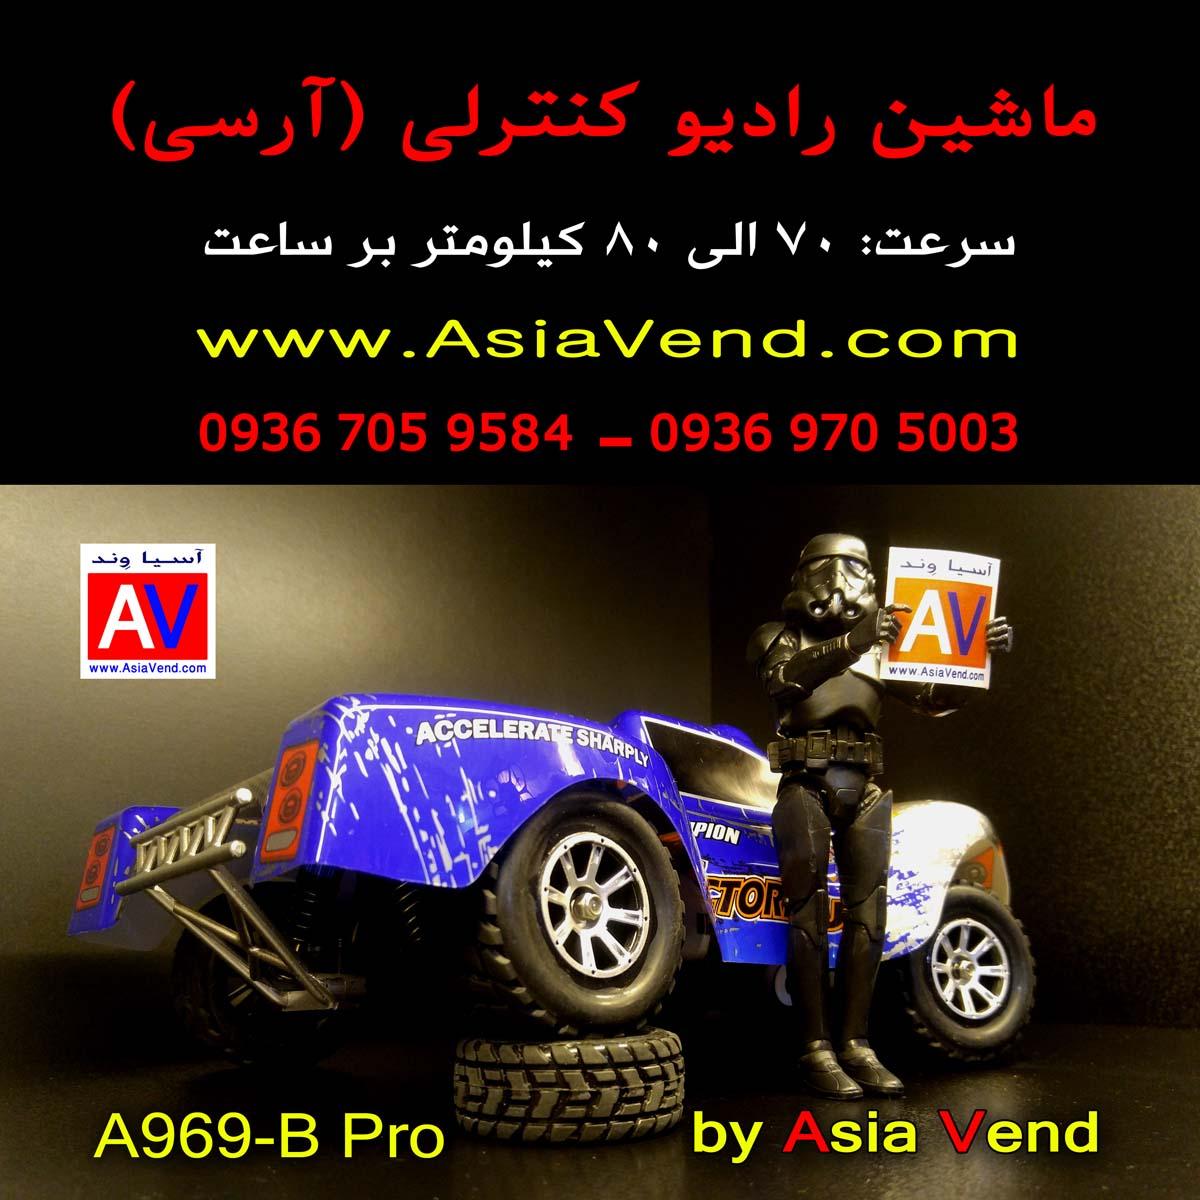 ماشین WLTOYS A969 B ماشین کنترلی حرفه ای آرسی Wltoys A969B Rc Car